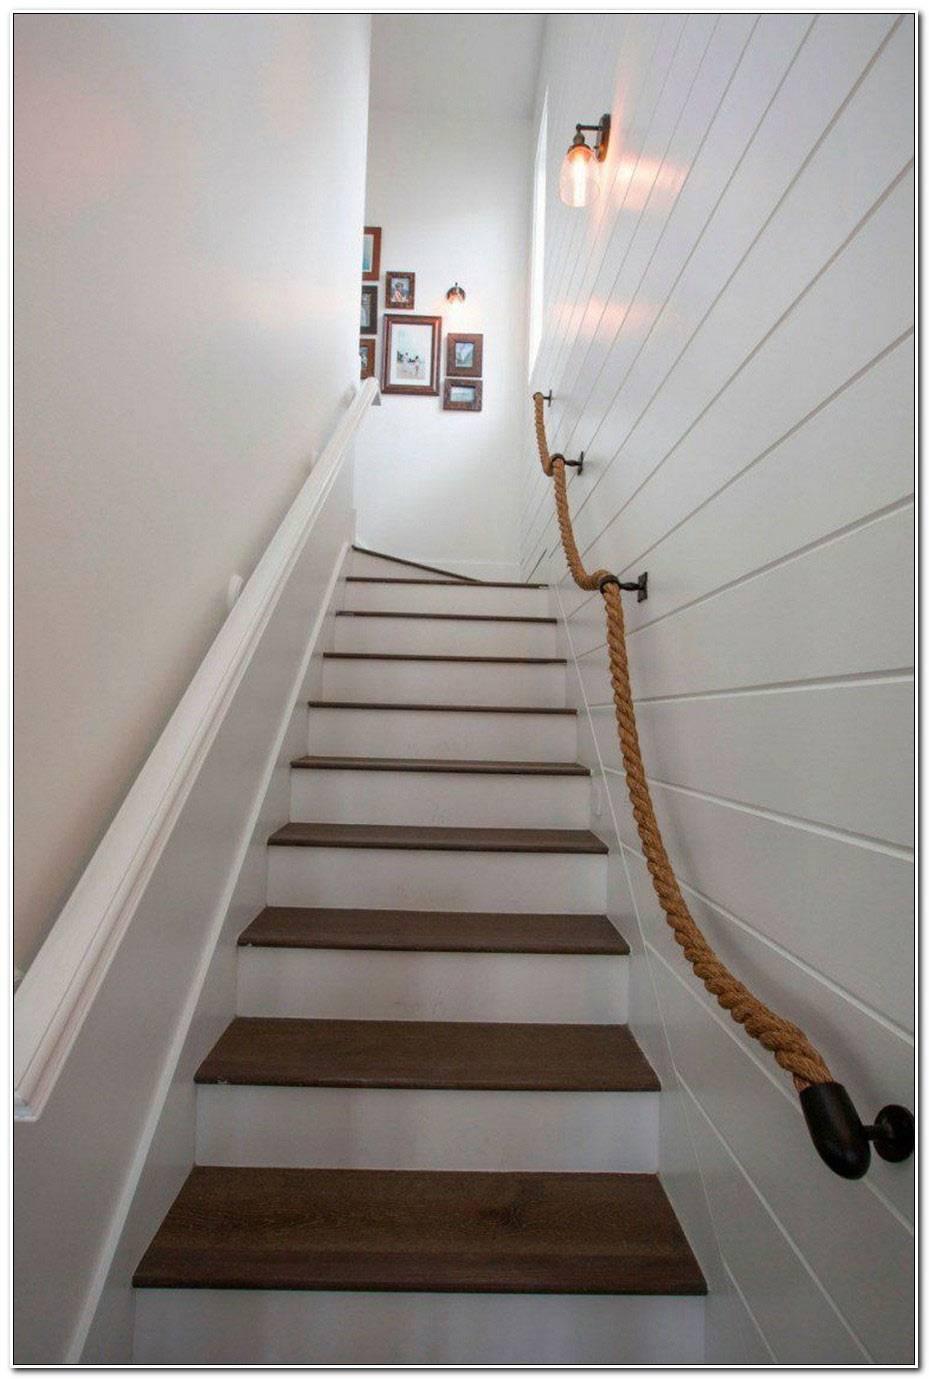 Deco Cage Escalier Interieur